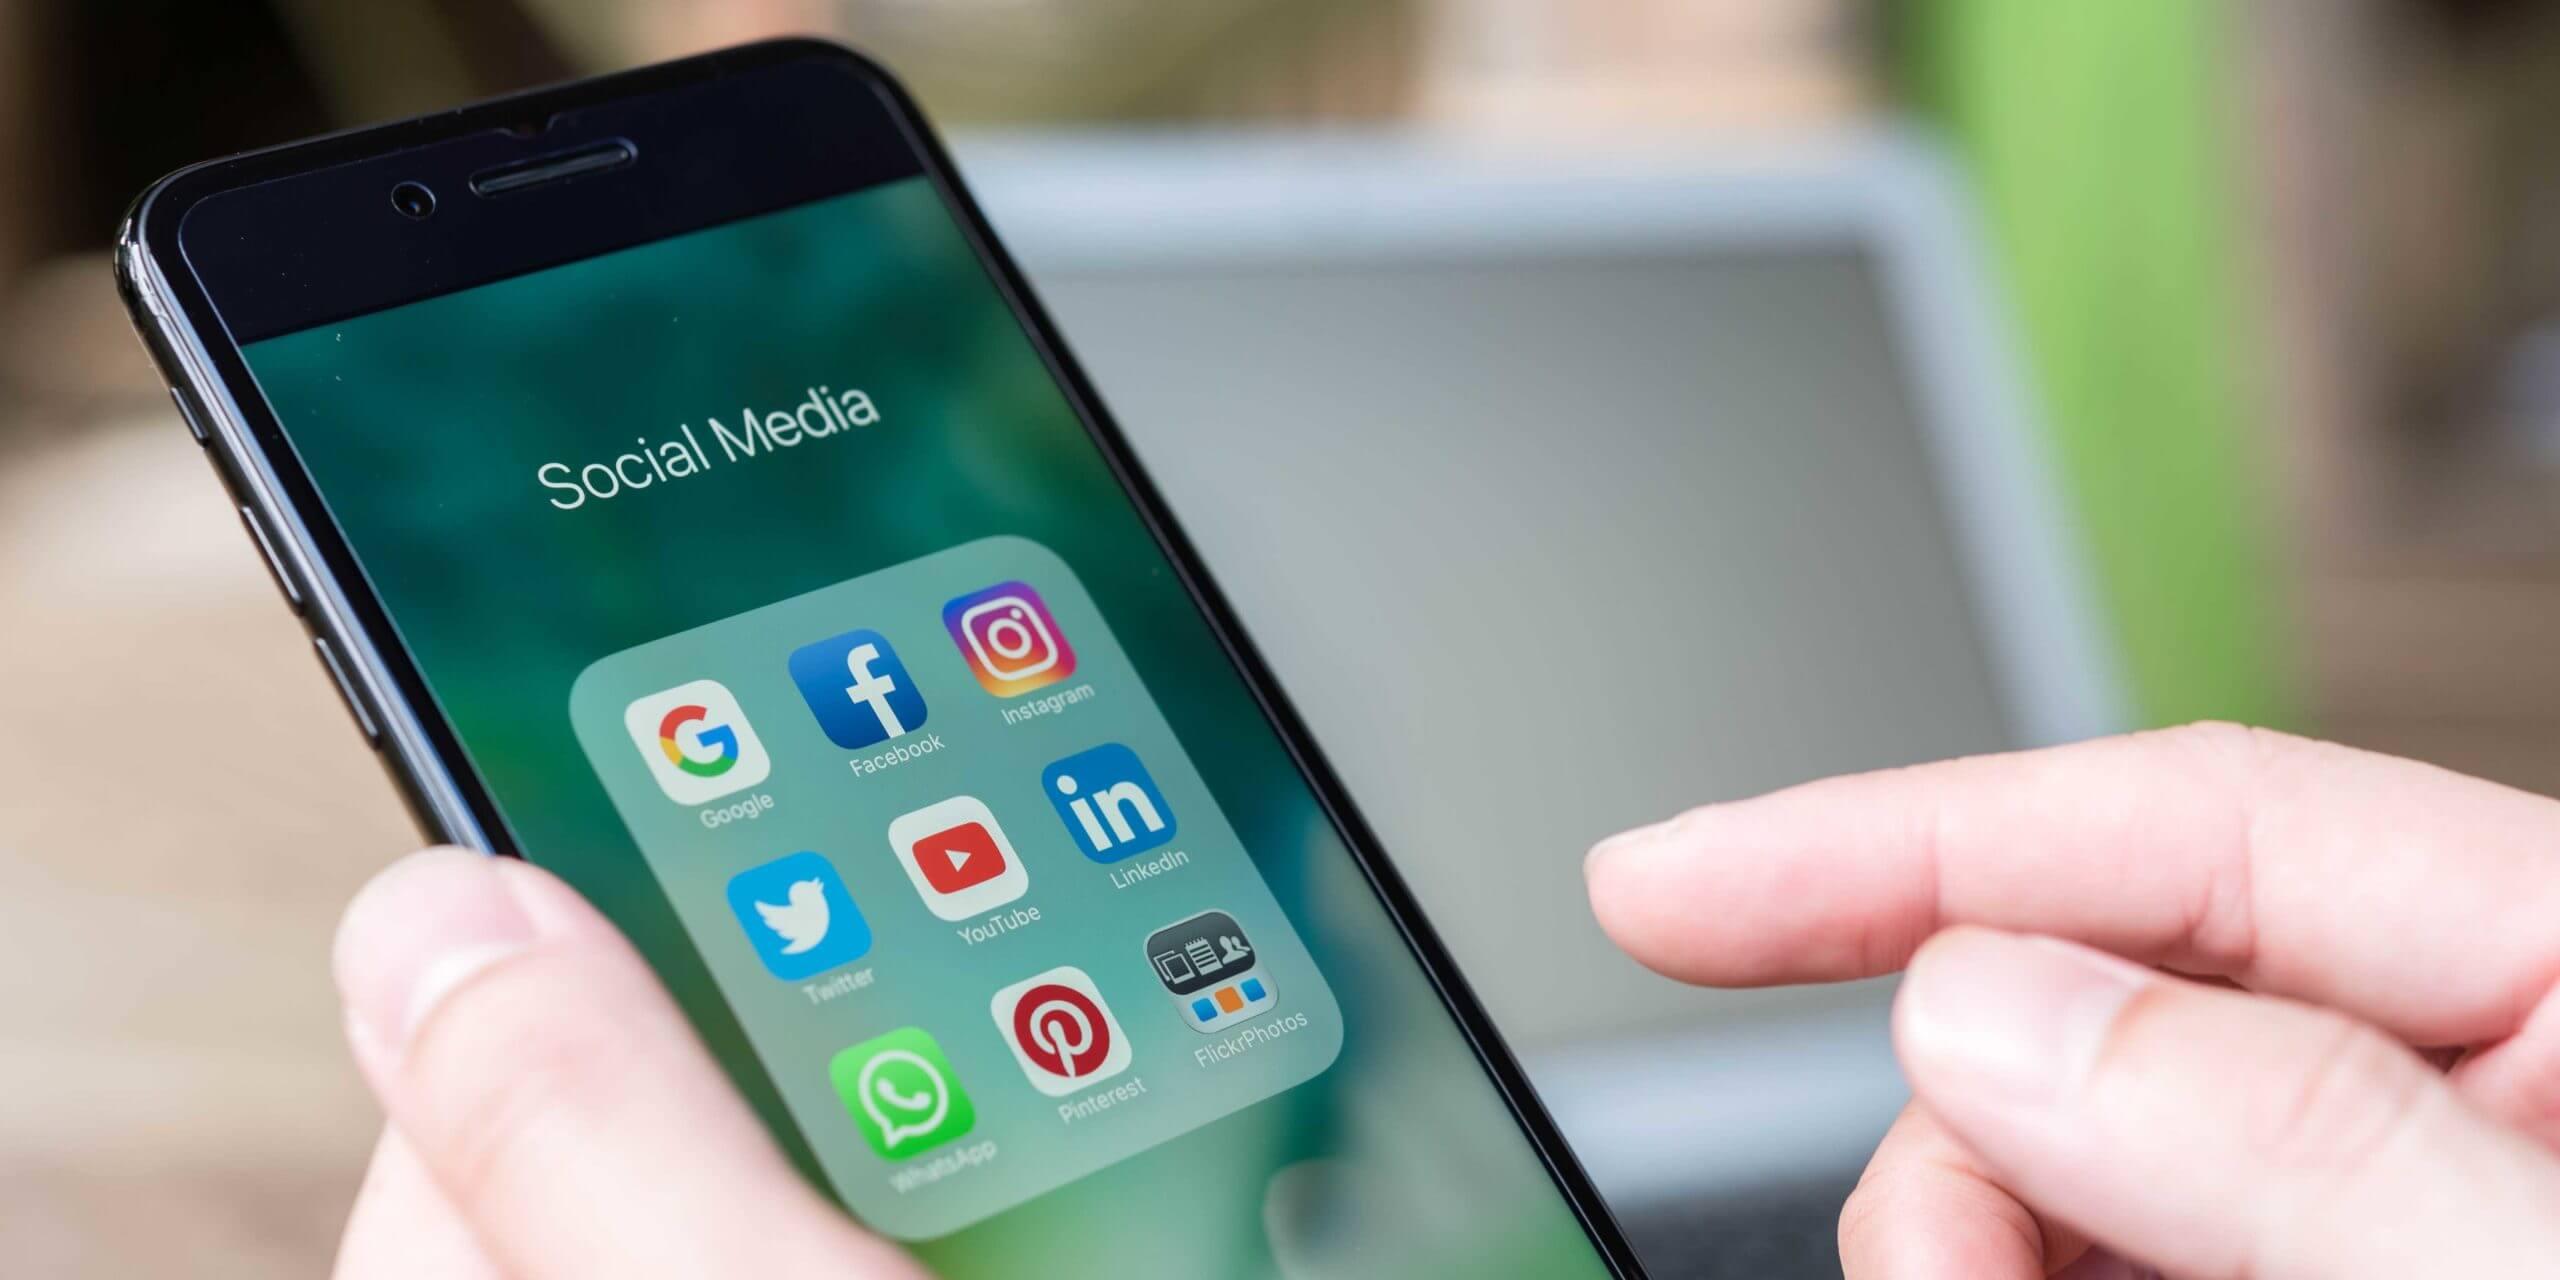 Hand posting on social media